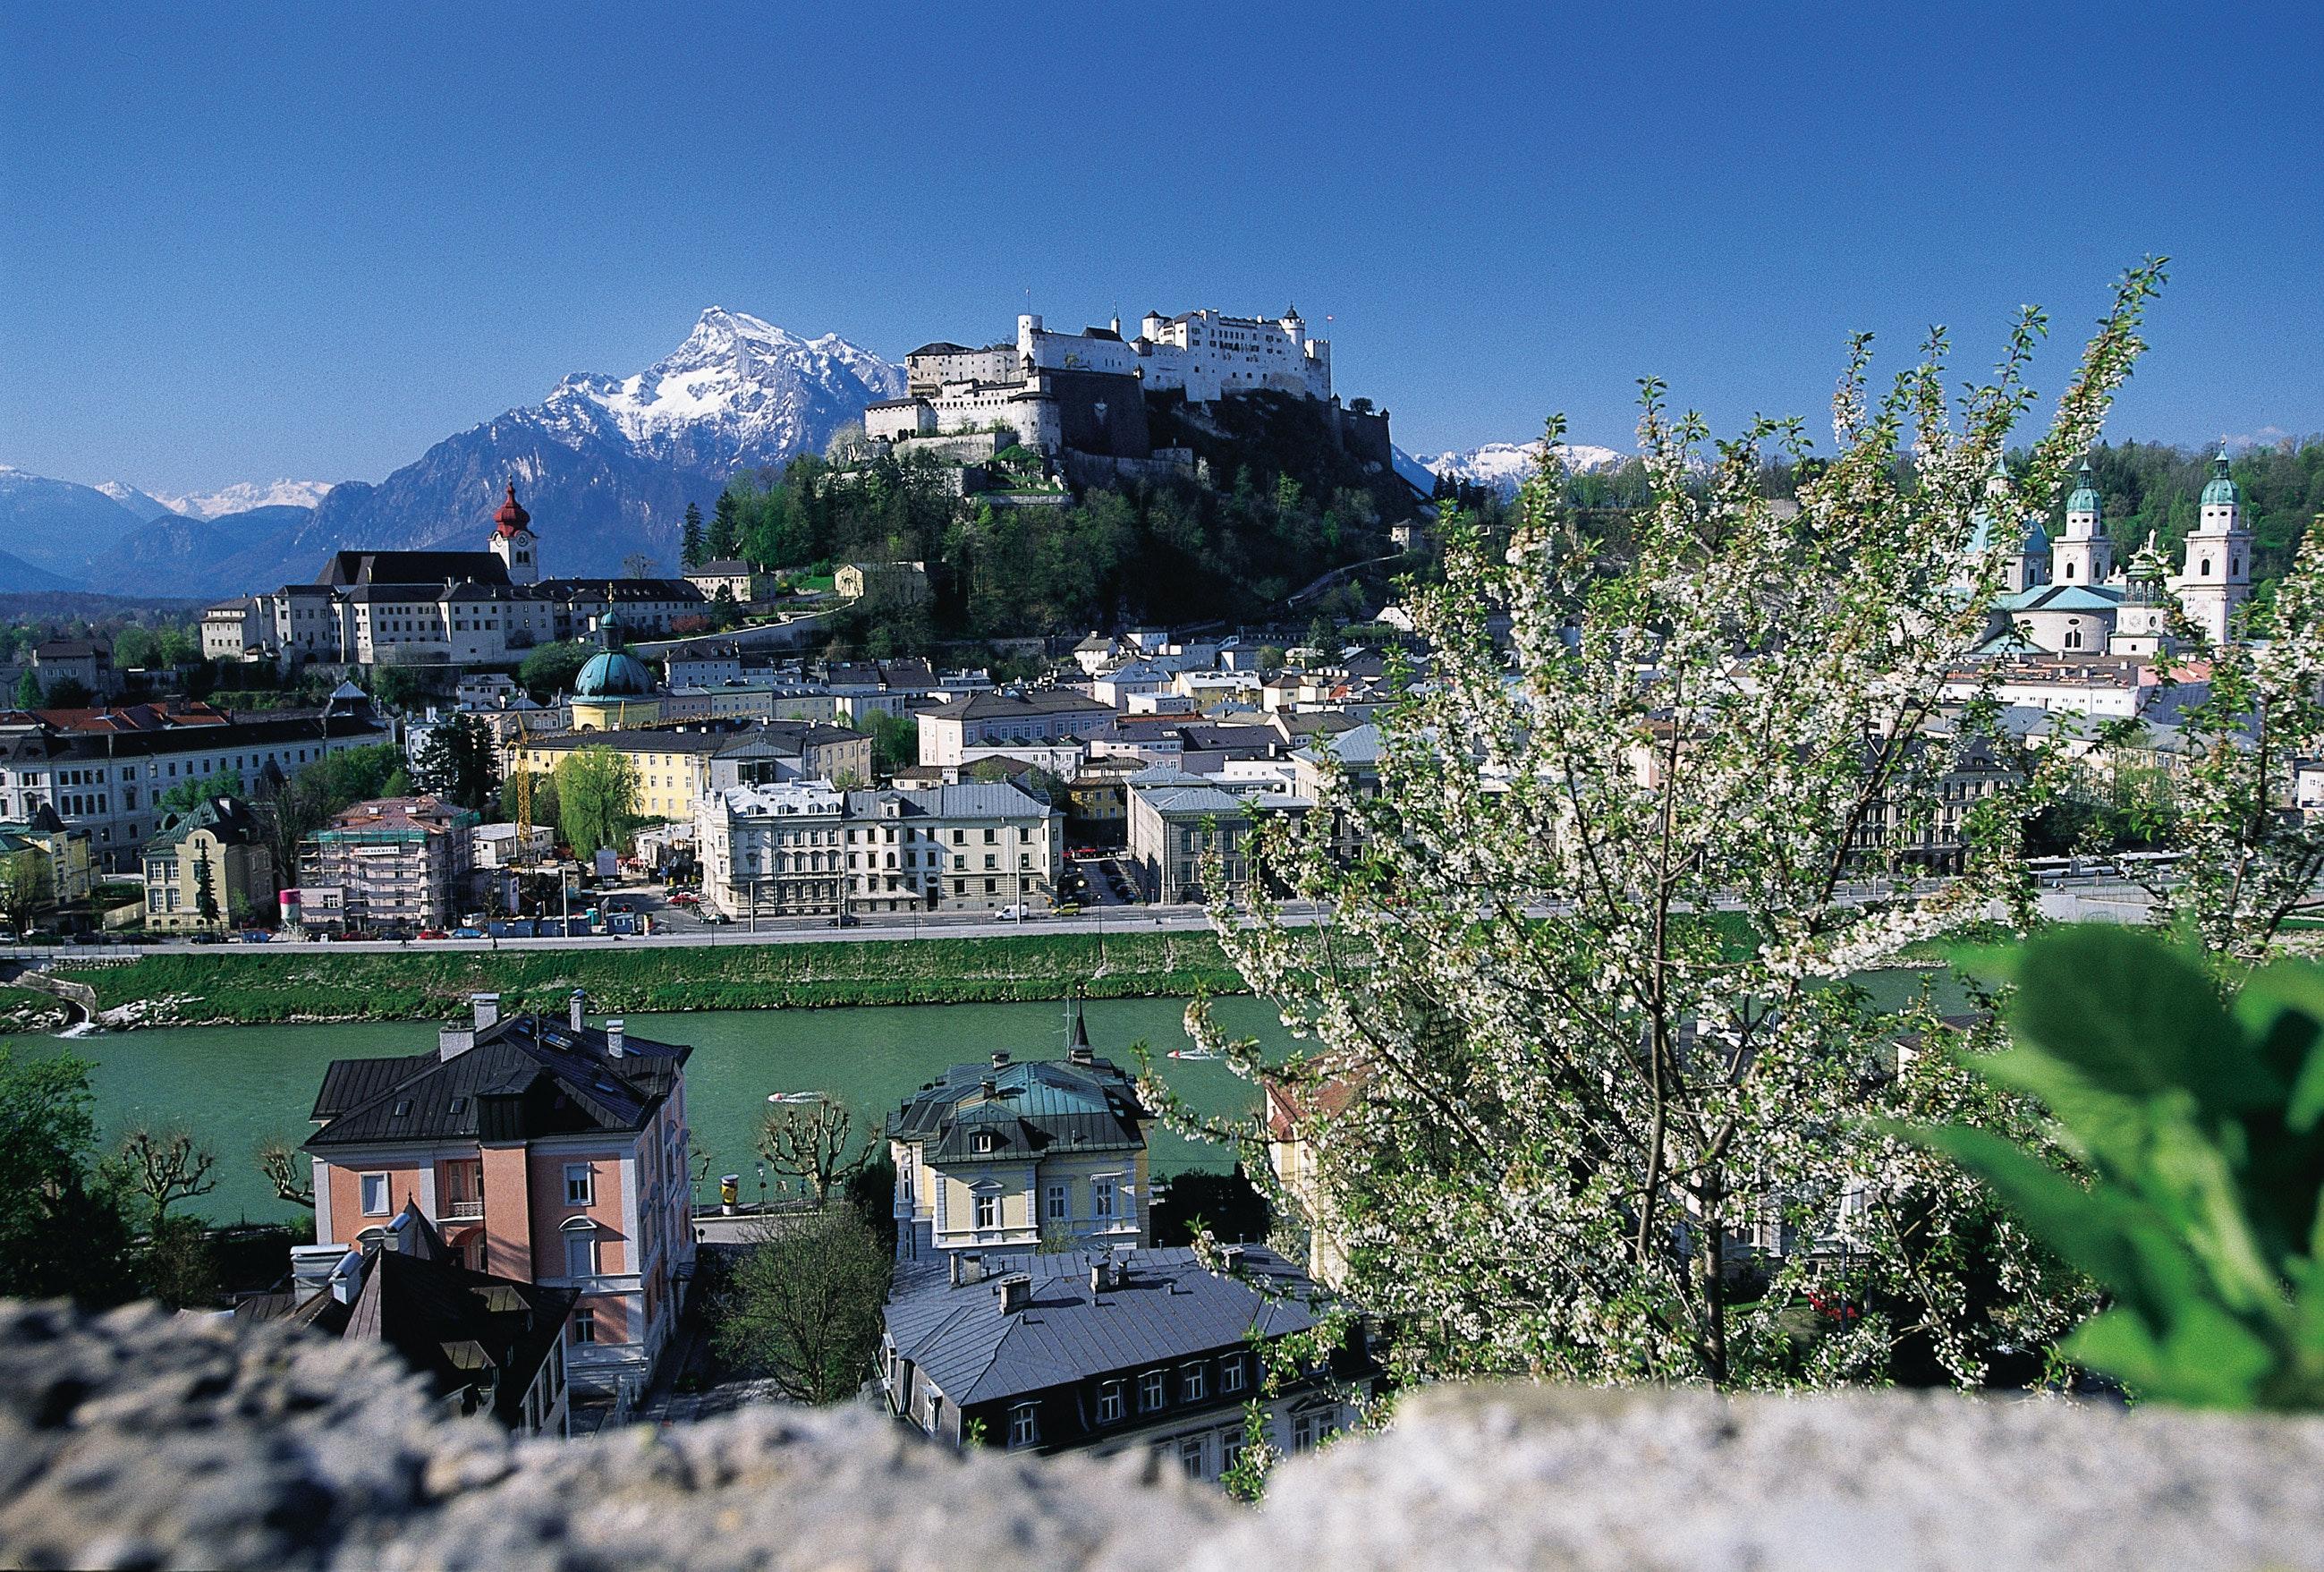 Omgeving  Alpe Adria